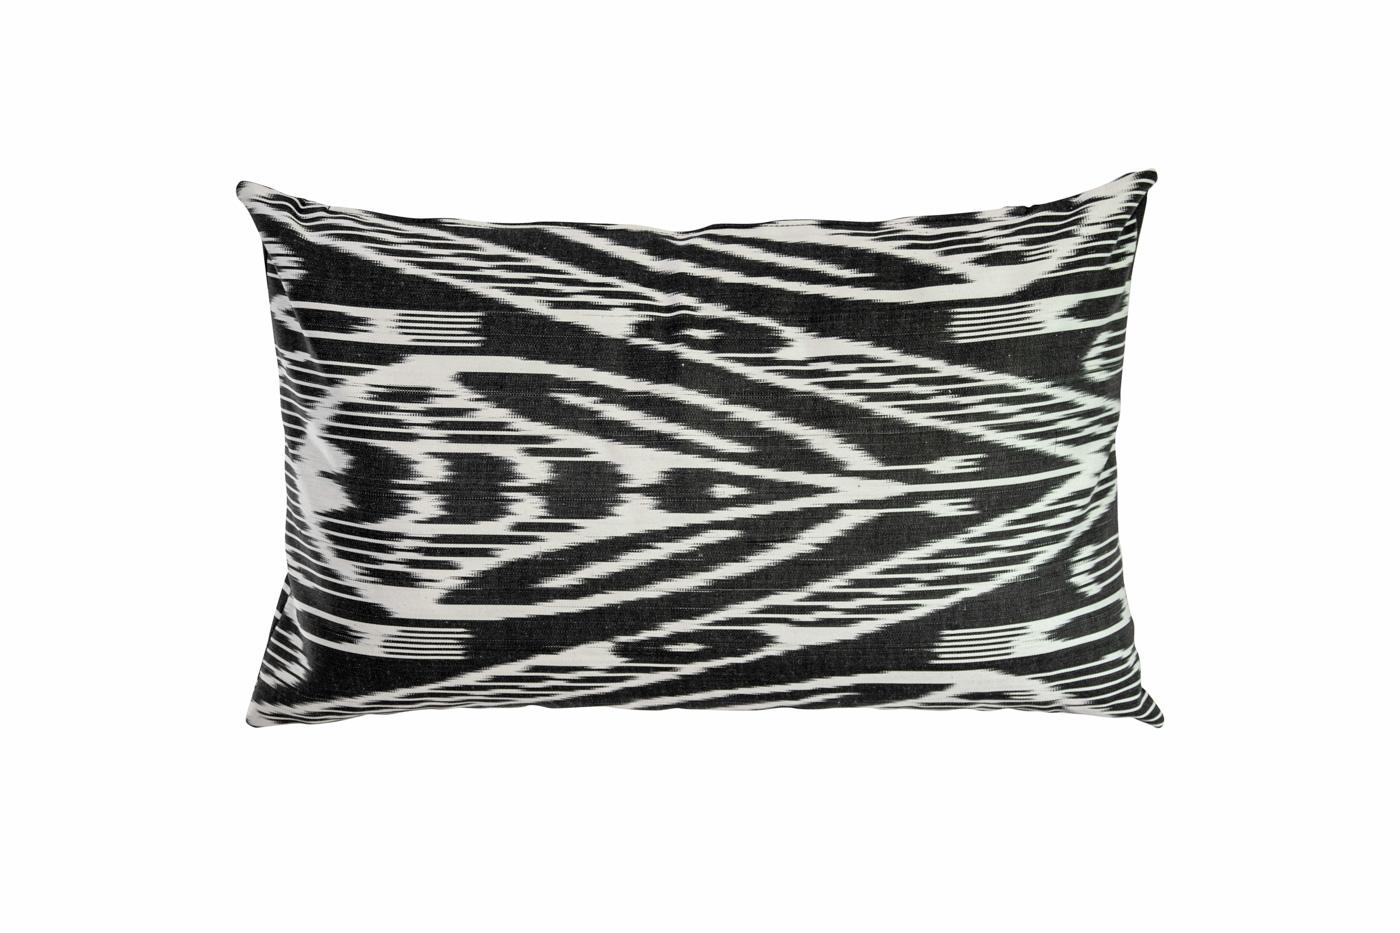 Cushion in ikat fabric black-white